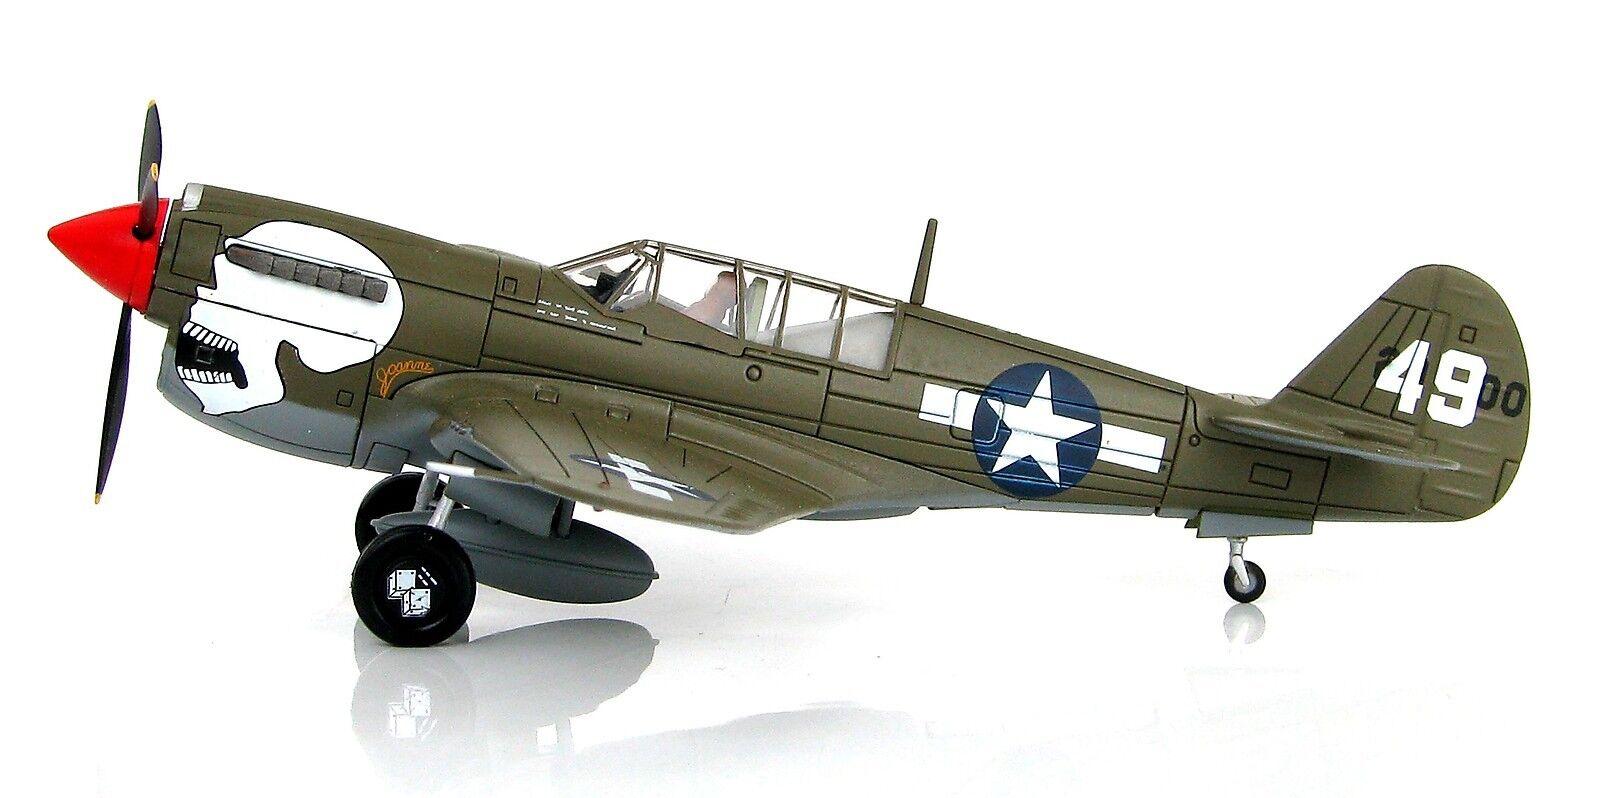 Hobby Master 1:72 USAAF Curtiss P-40N Warhawk Fighter,  HA5503